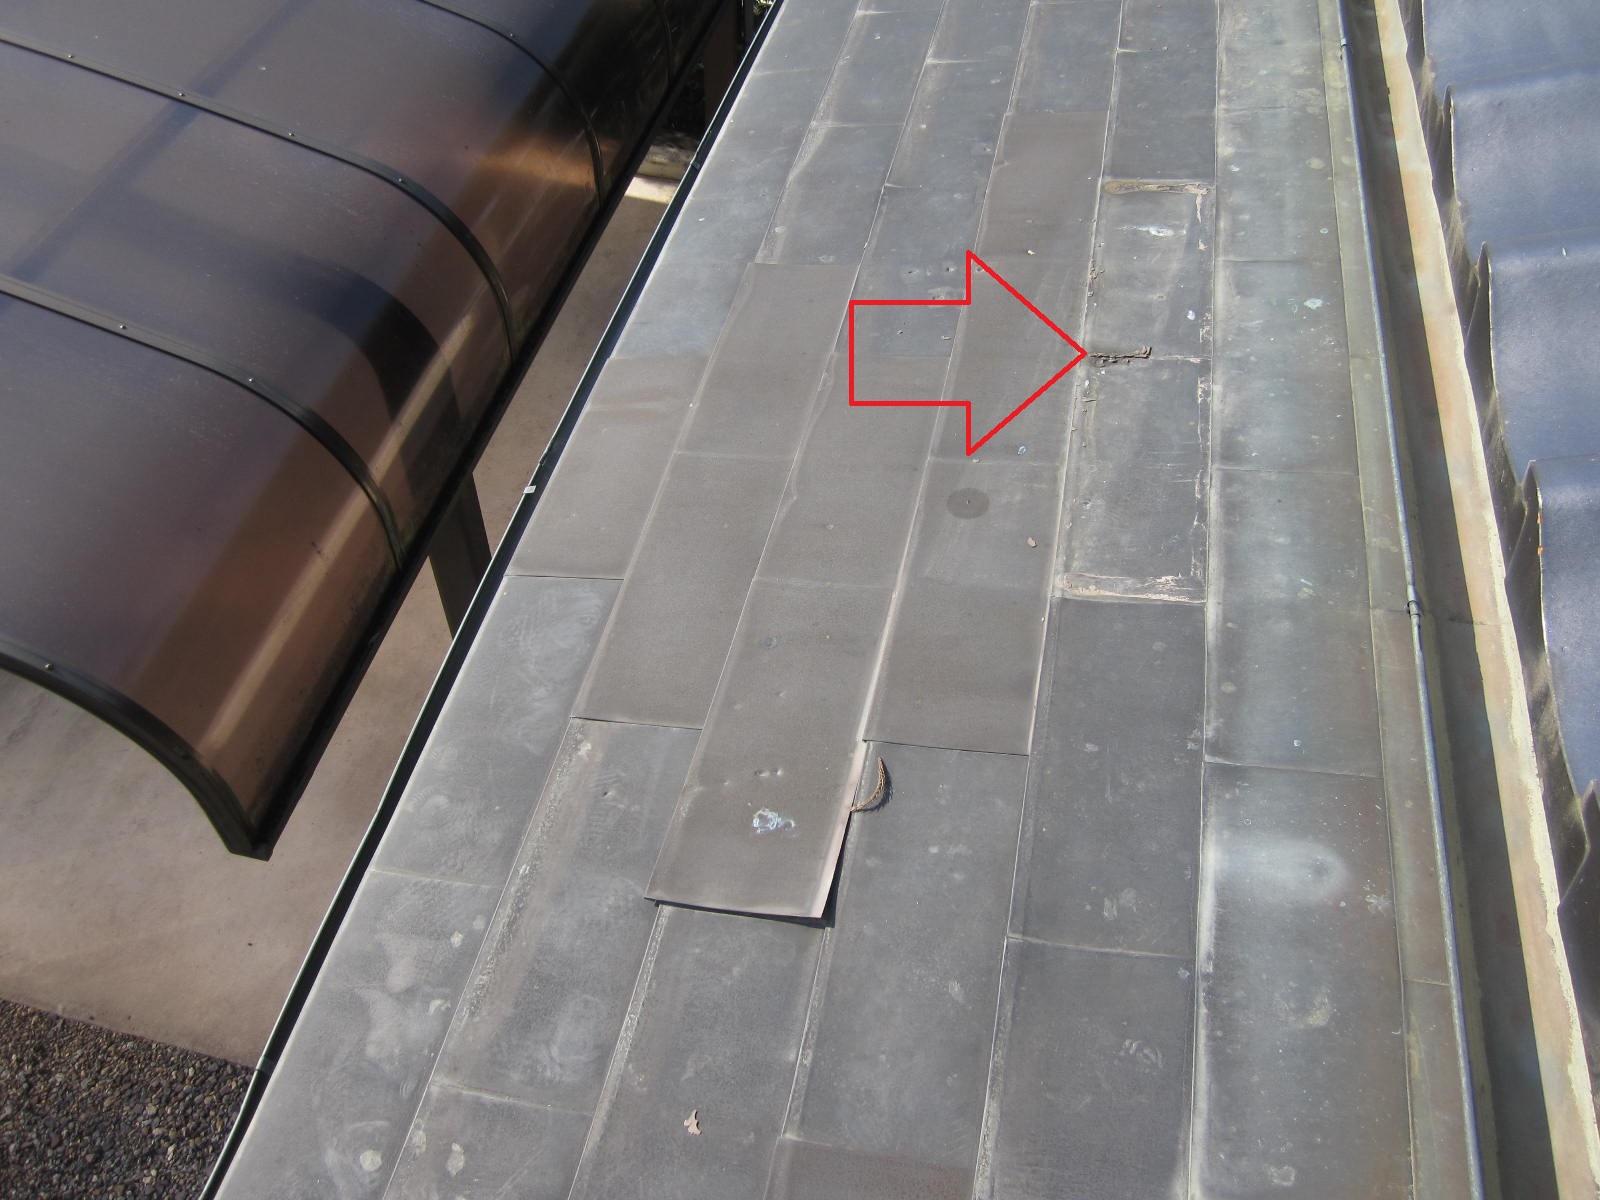 銅板一文字葺き屋根の補修工事! in那須烏山市